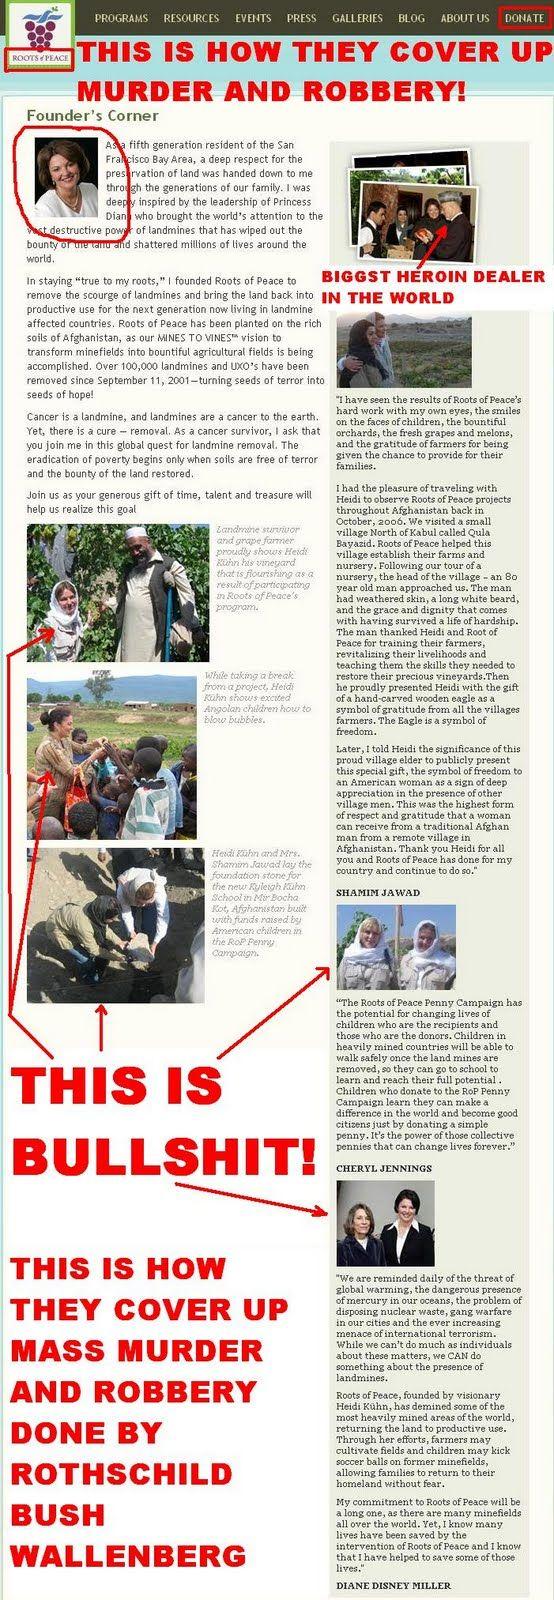 stefanlofven: Roots of Peace-Founder's Corner - Scam - Fraud - C...